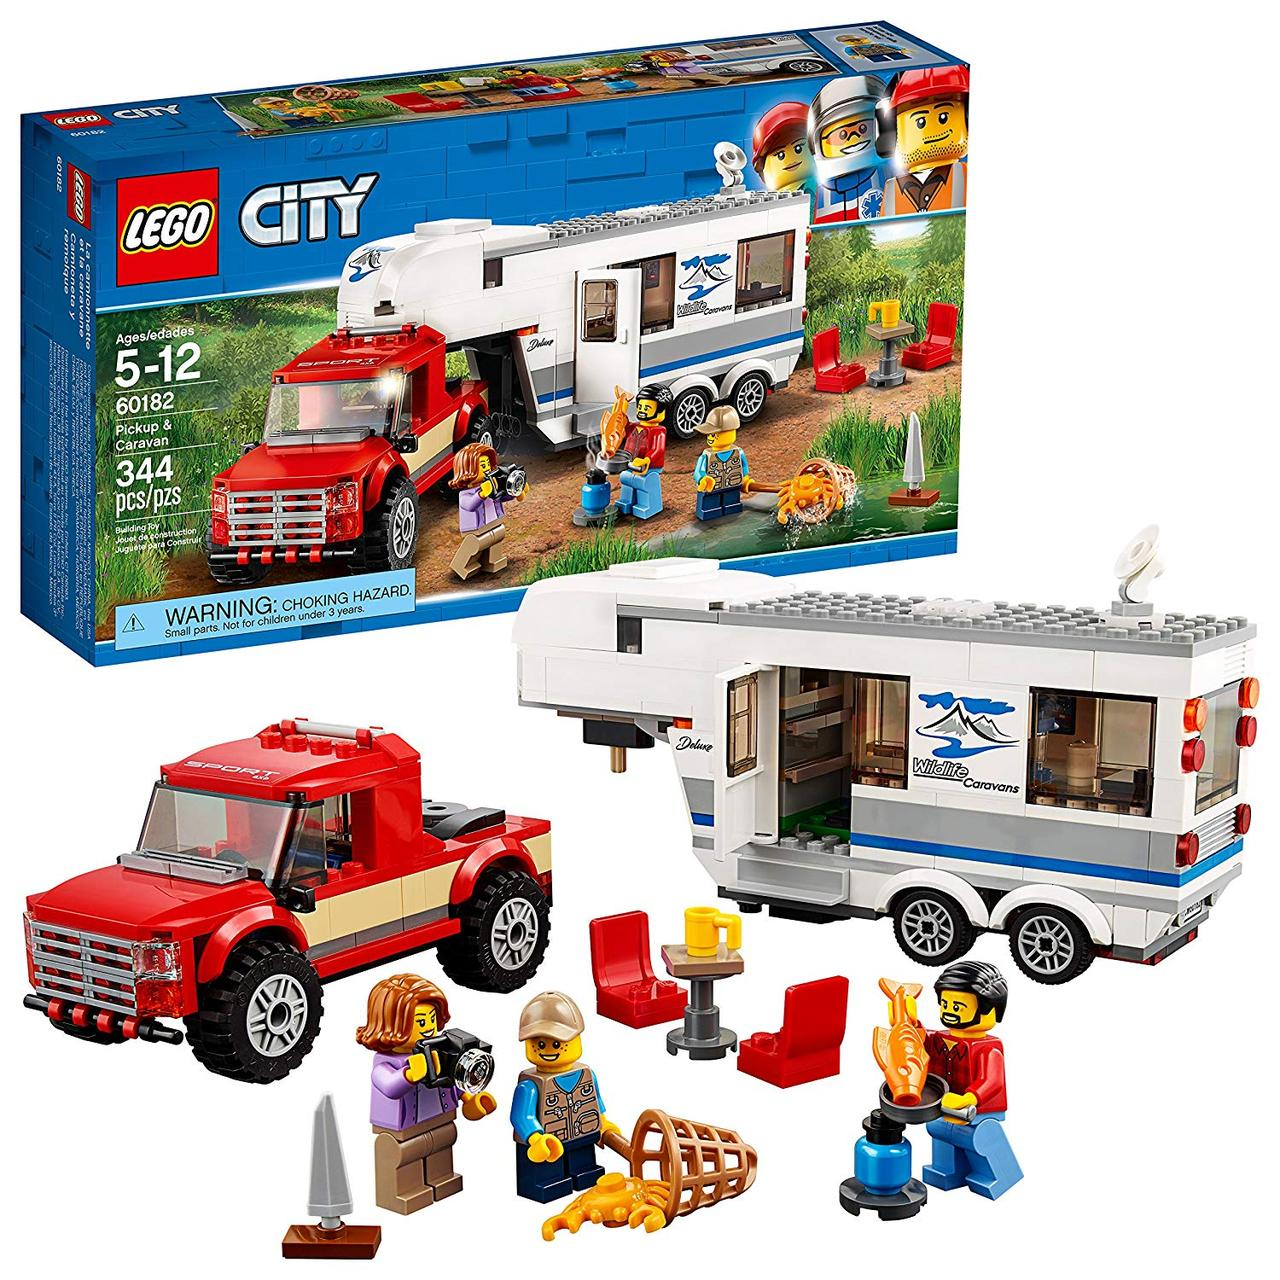 Конструктор LEGO City Пикап и фургон 344 детали (60182)